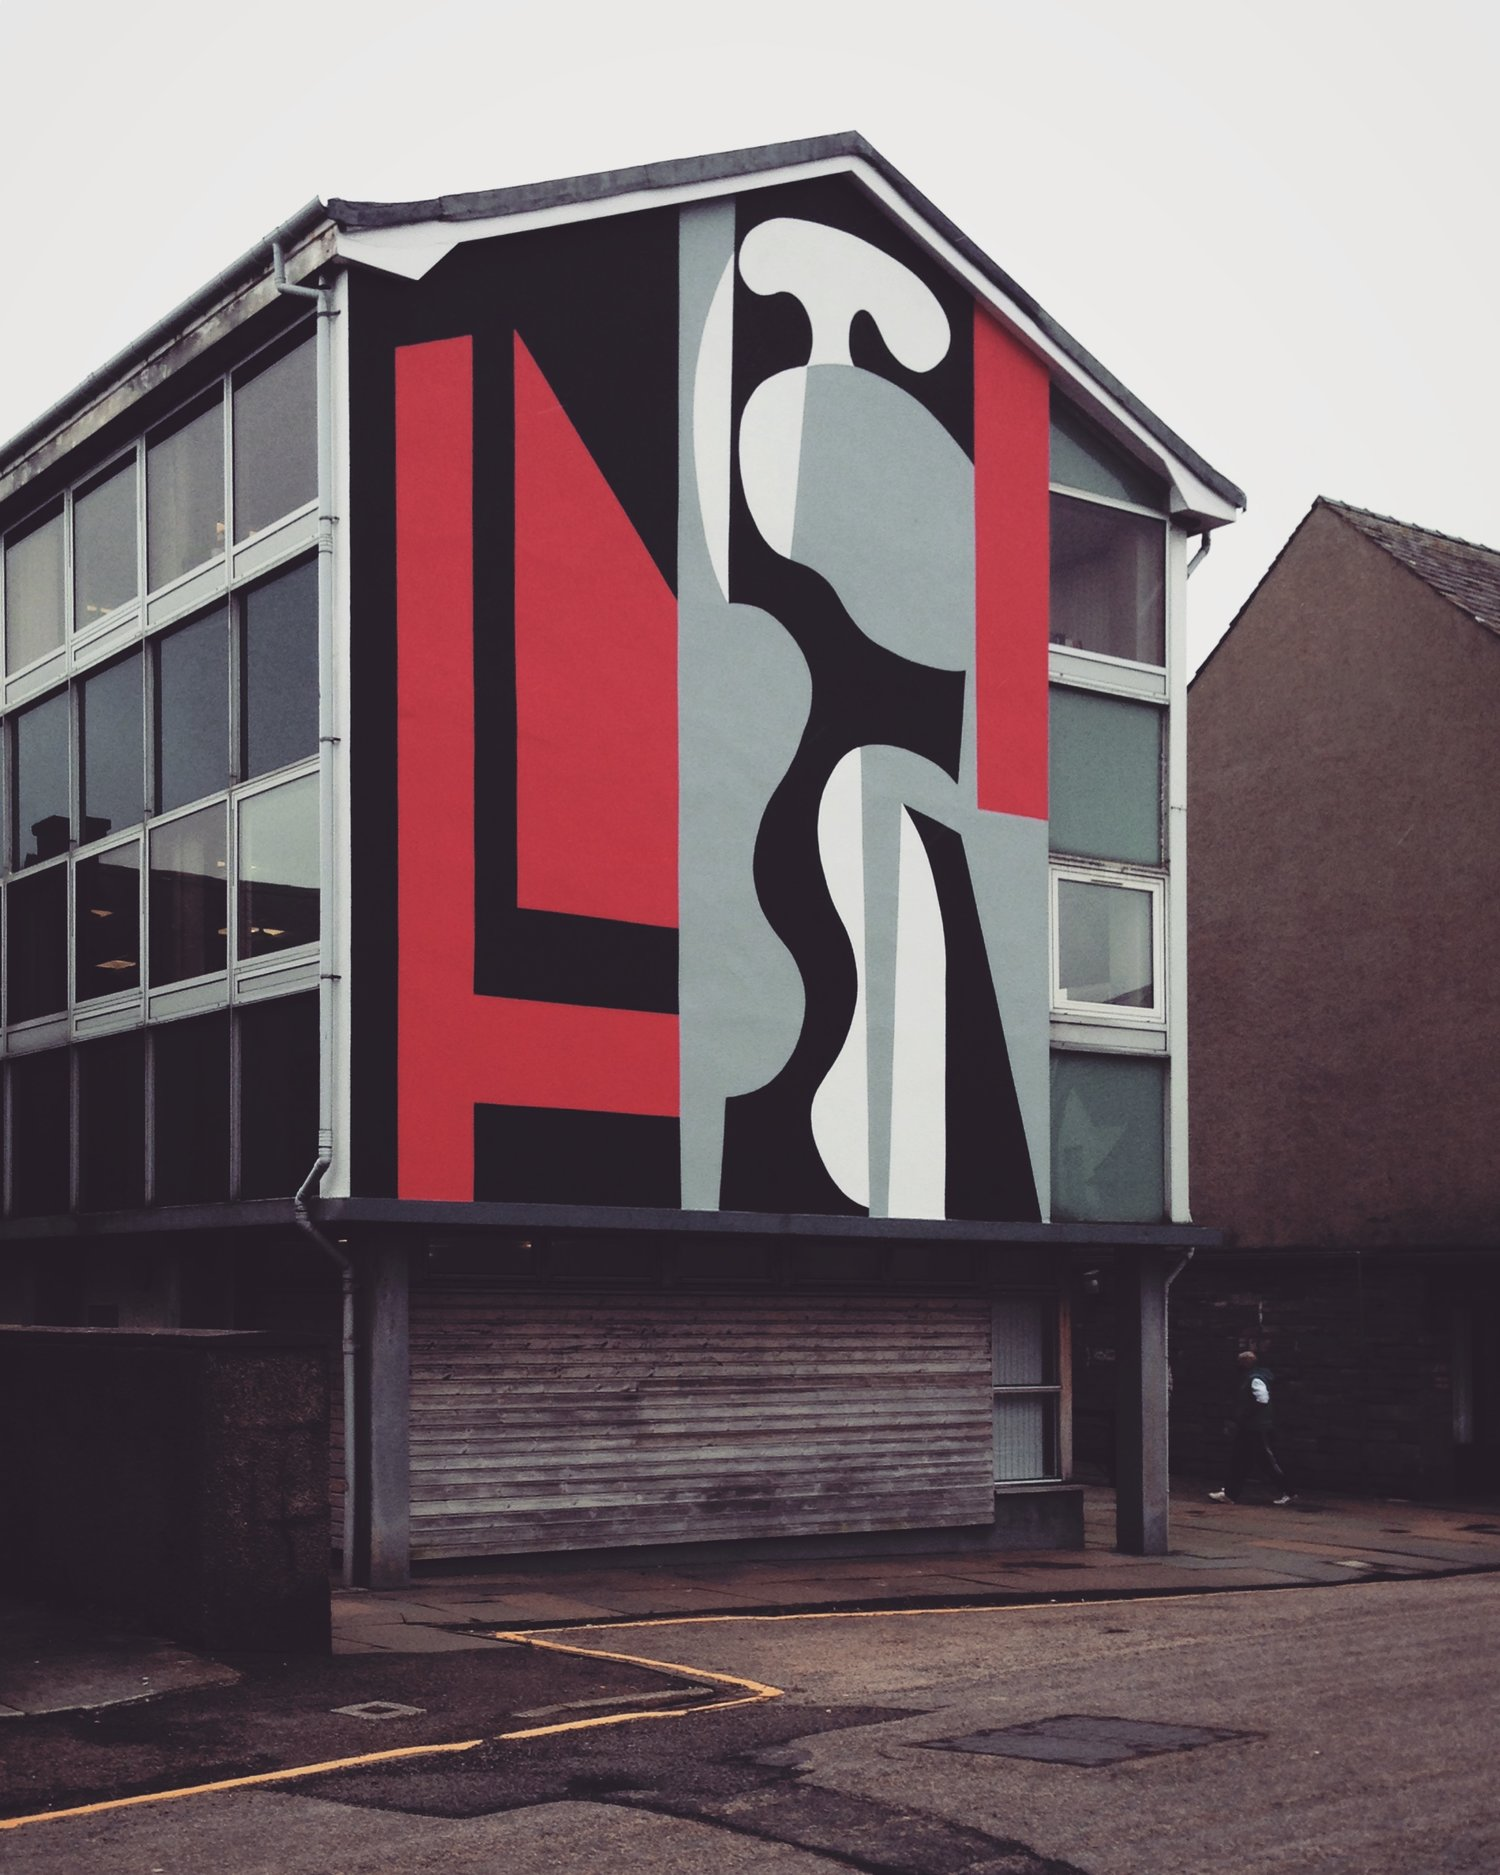 Tollemache+House+Thurso+Caithness+HIE.jpg